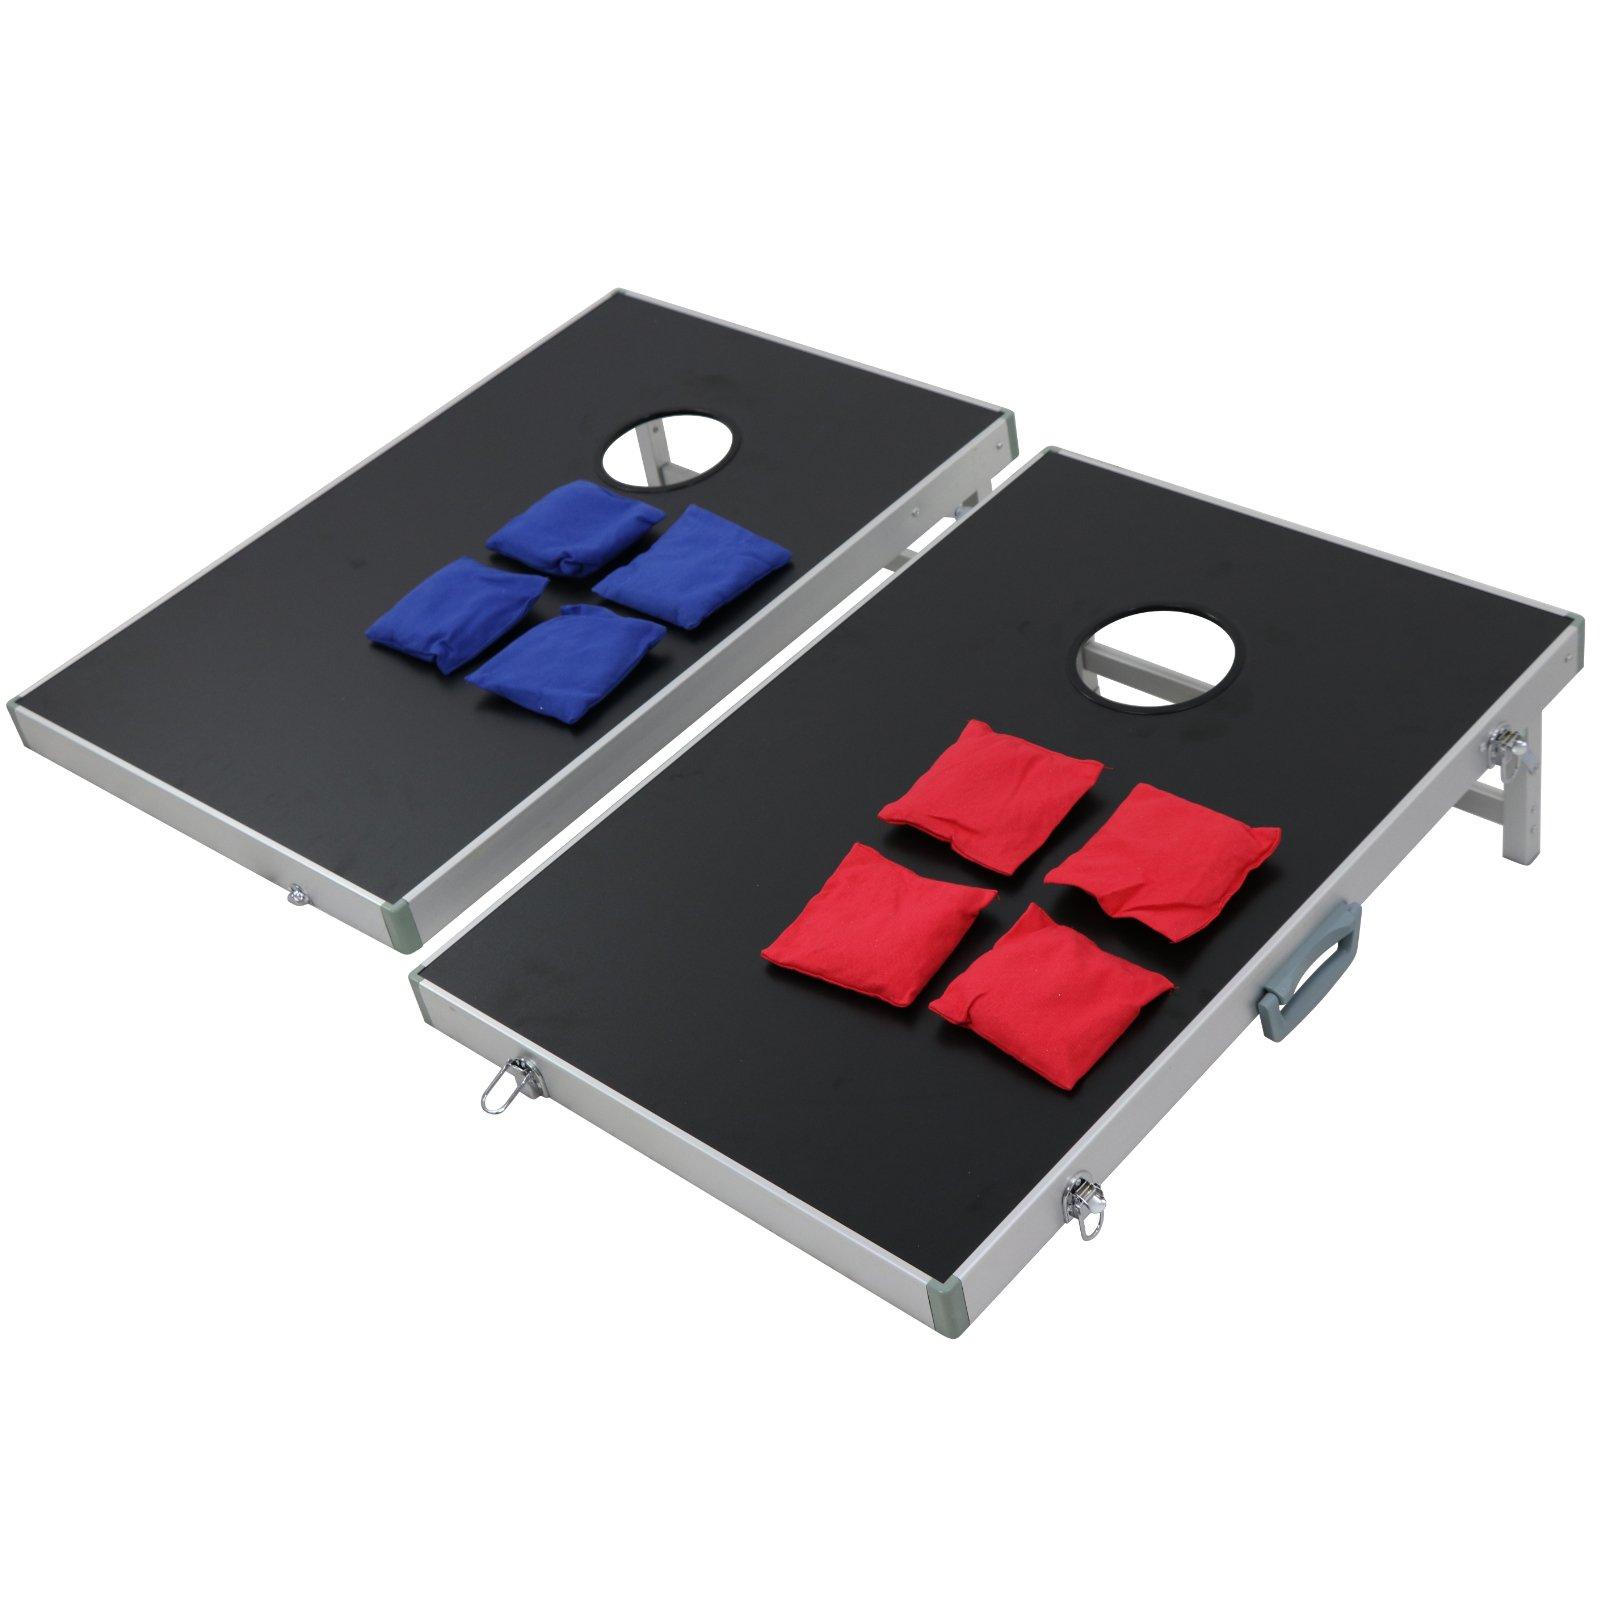 Nova Microdermabrasion Solid Wood Cornhole Bean Bag Toss Game Set Regulation Size Board Game W/ 8 Bean Bags & Carrying Case (3ft2ft Aluminum frame)